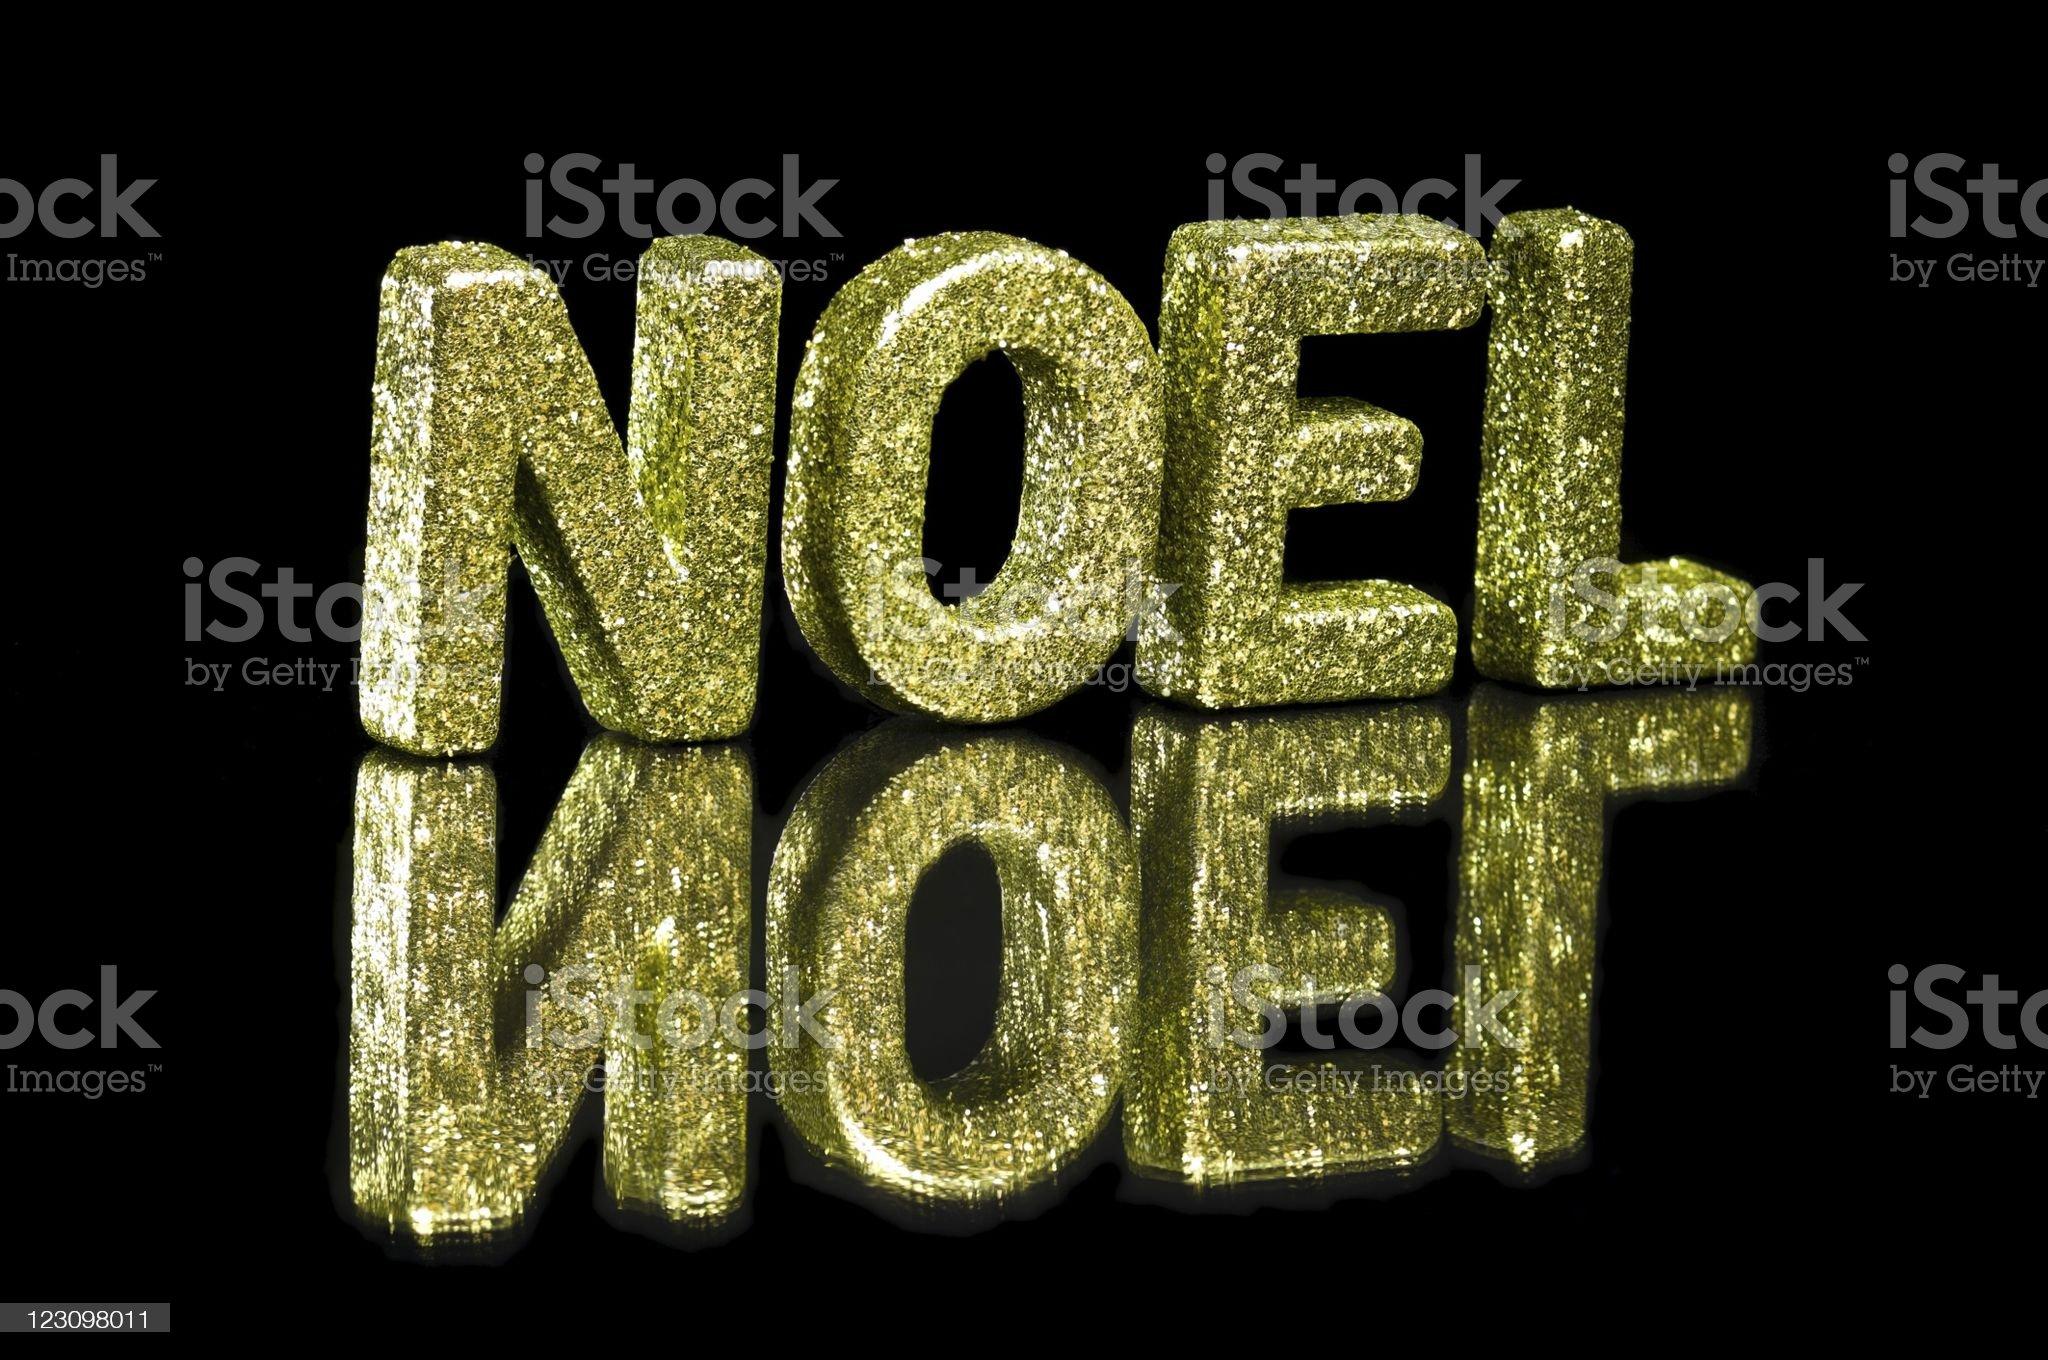 In capital letter written noel, glitter effect over black royalty-free stock photo